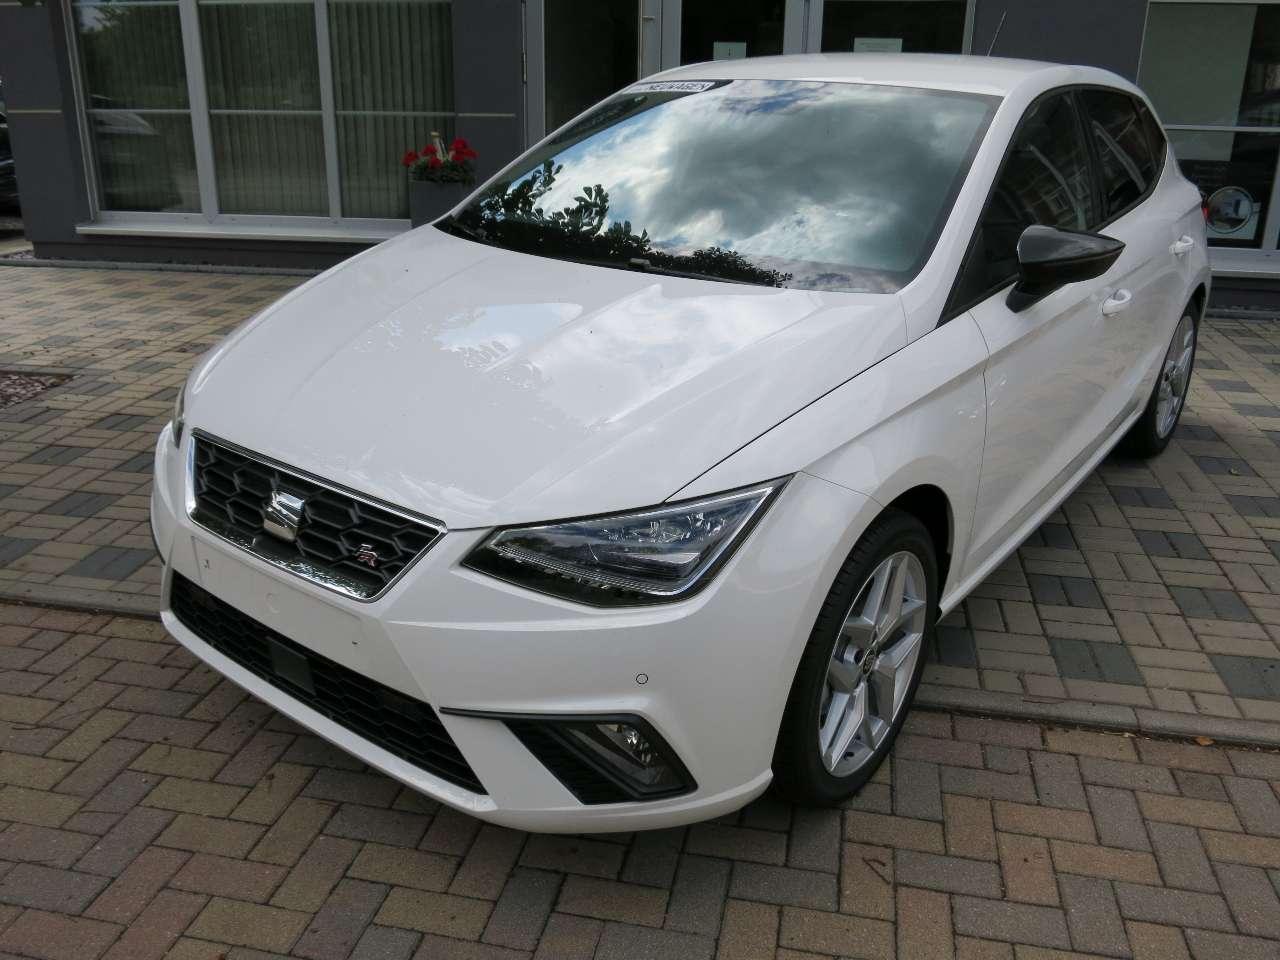 SEAT Ibiza FR (KJ1) Garantie bis 07/2025 od. 100tkm LED NAVI